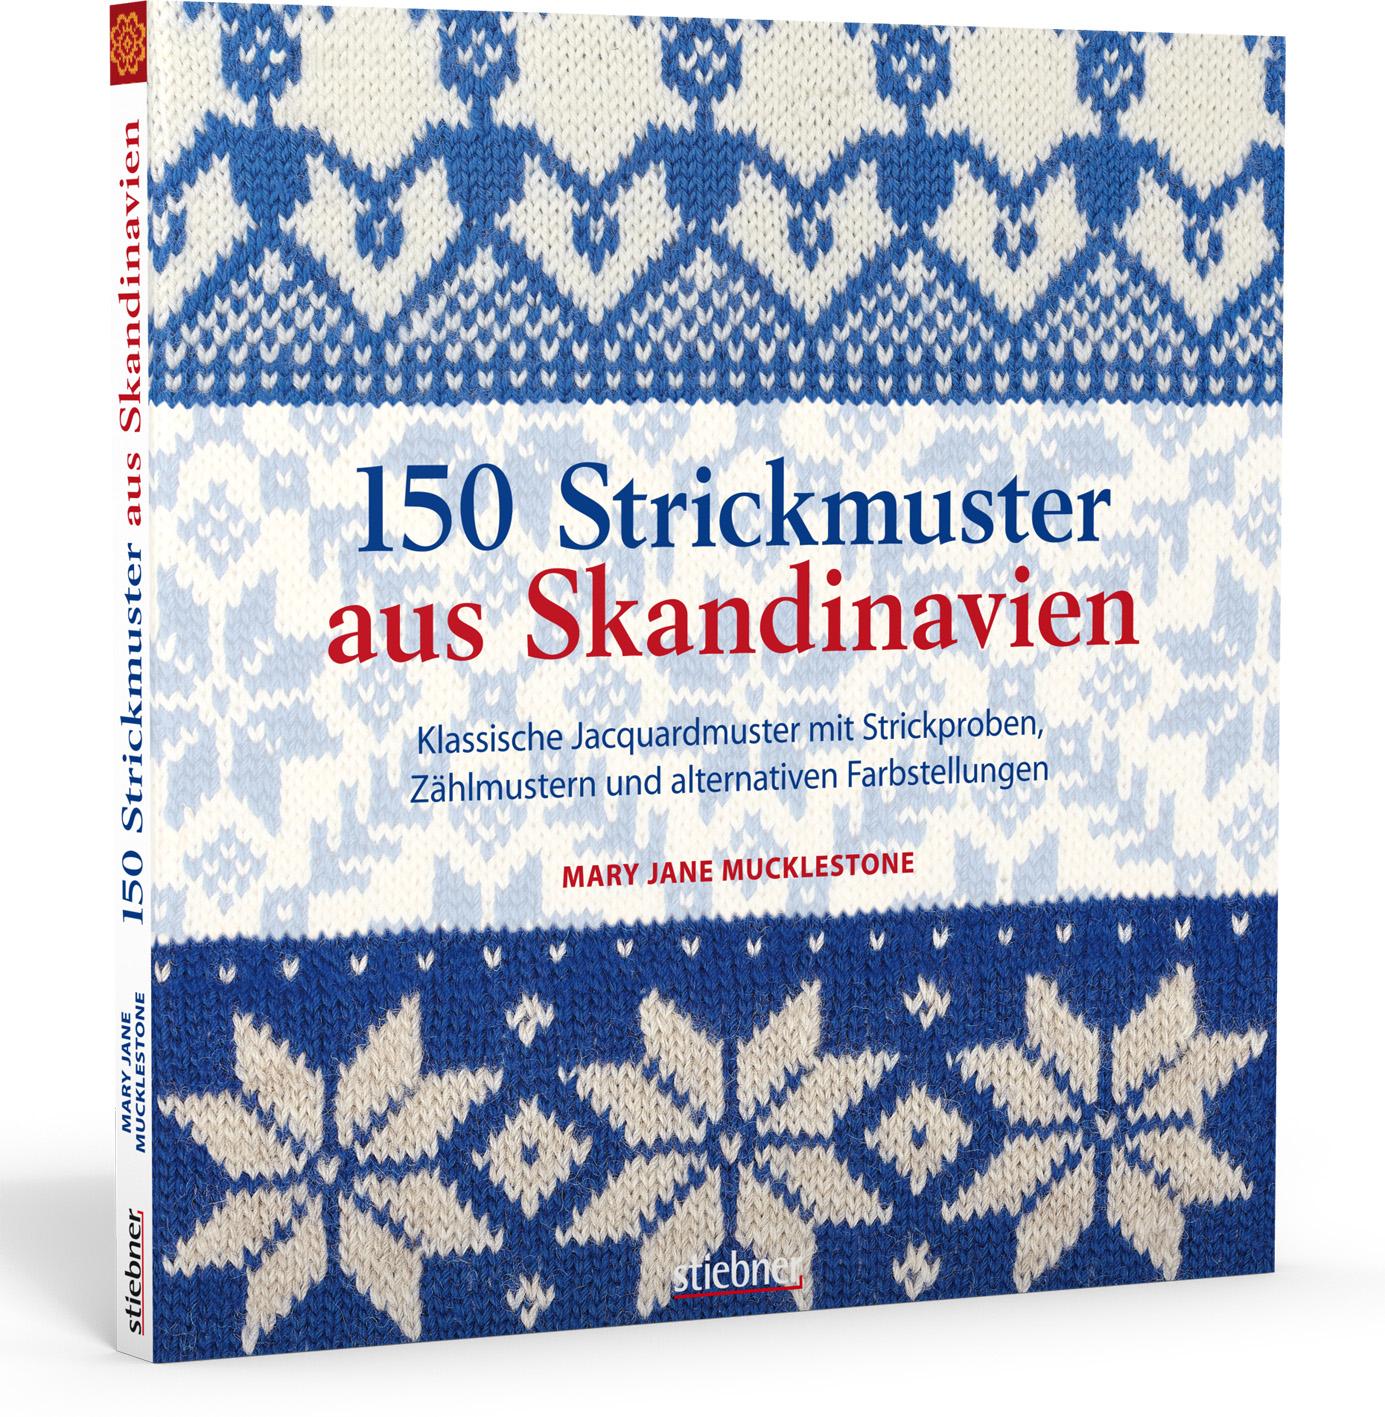 Mucklestone 150 Strickmuster aus Skandinavien